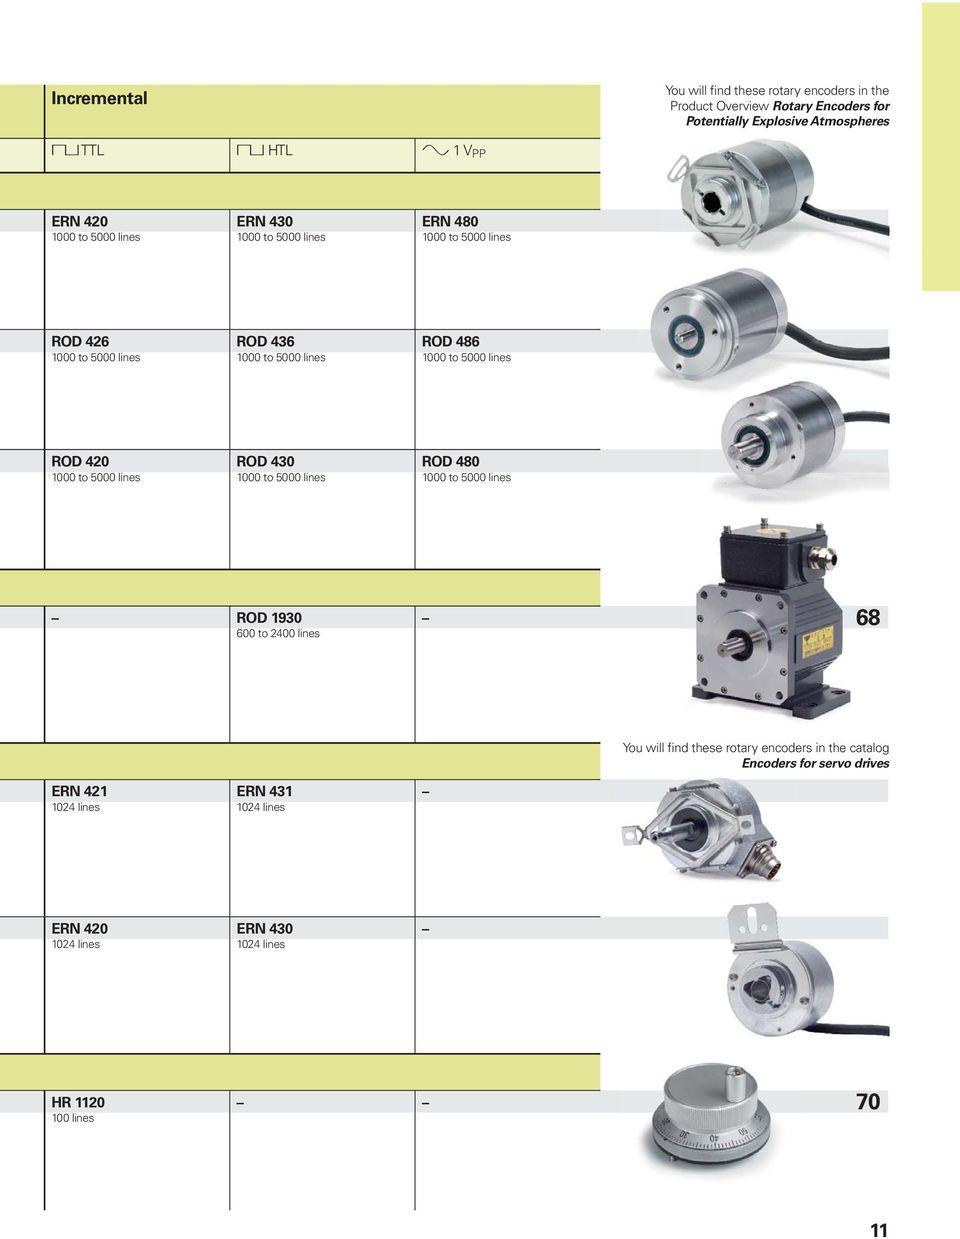 heidenhain encoder rod 431 wiring diagram 2008 ford f250 ignition rotary encoders november pdf lines 420 430 480 1000 to 5000